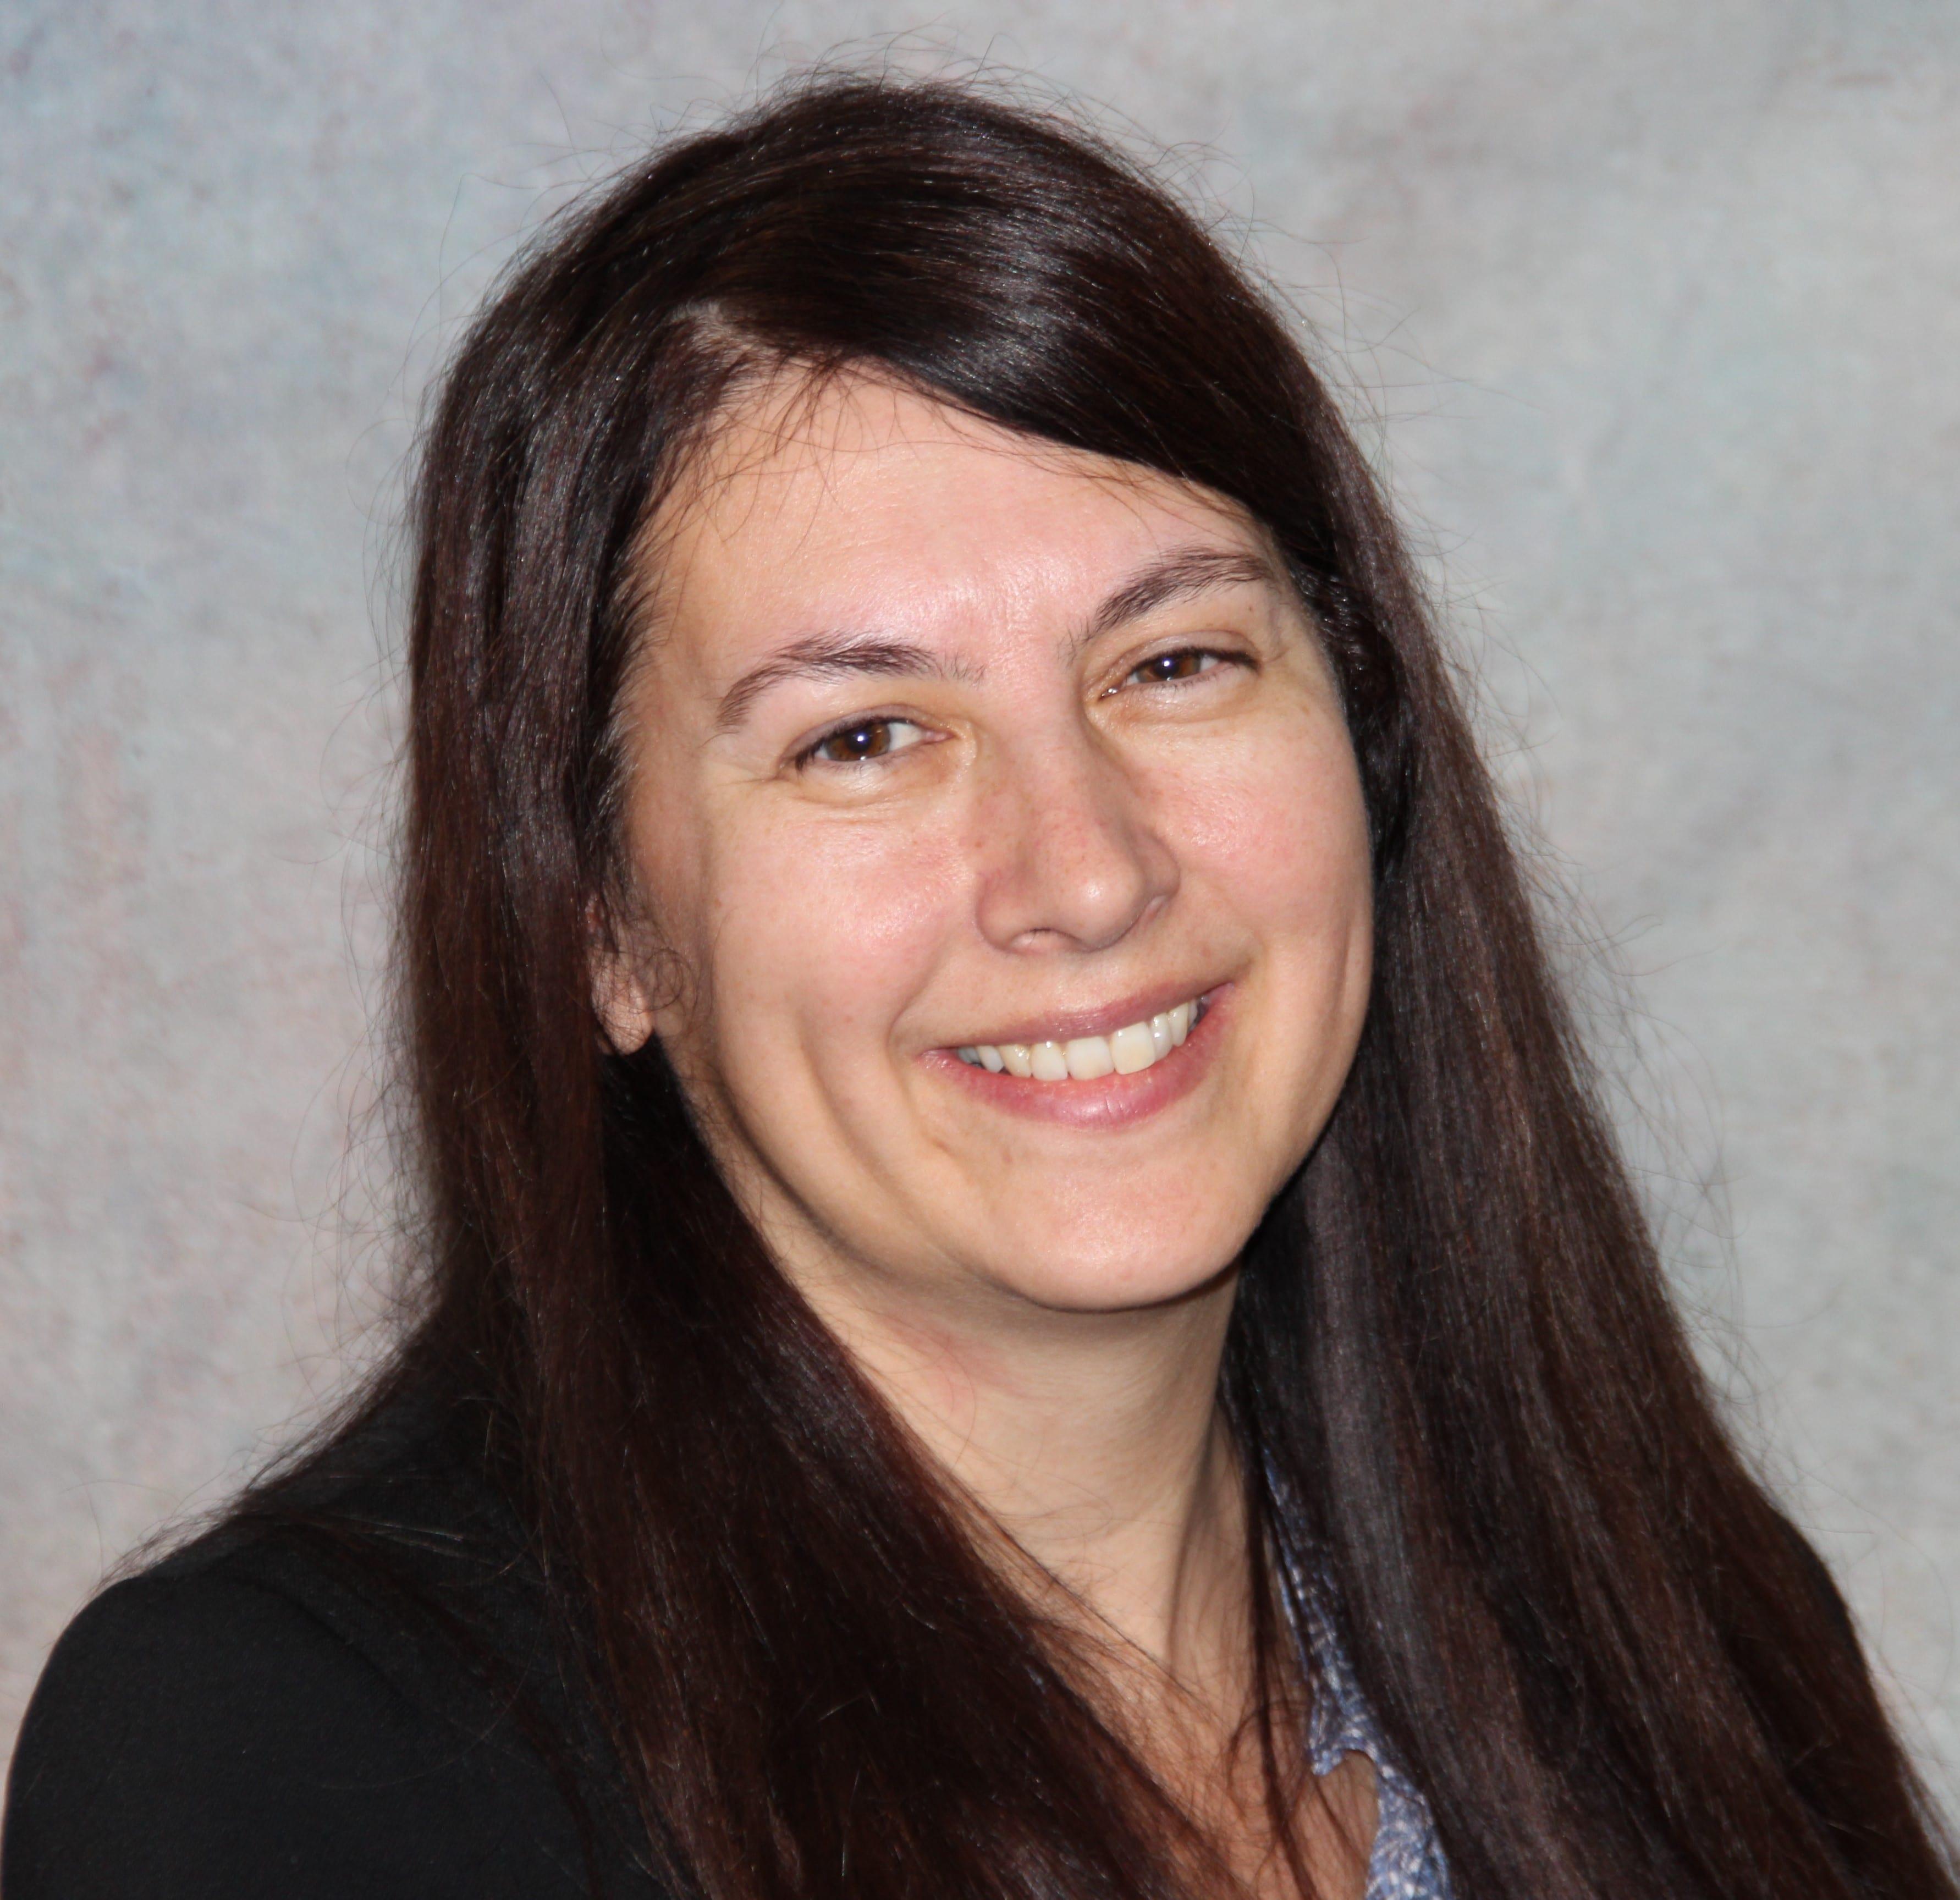 Principal Liz Barrett